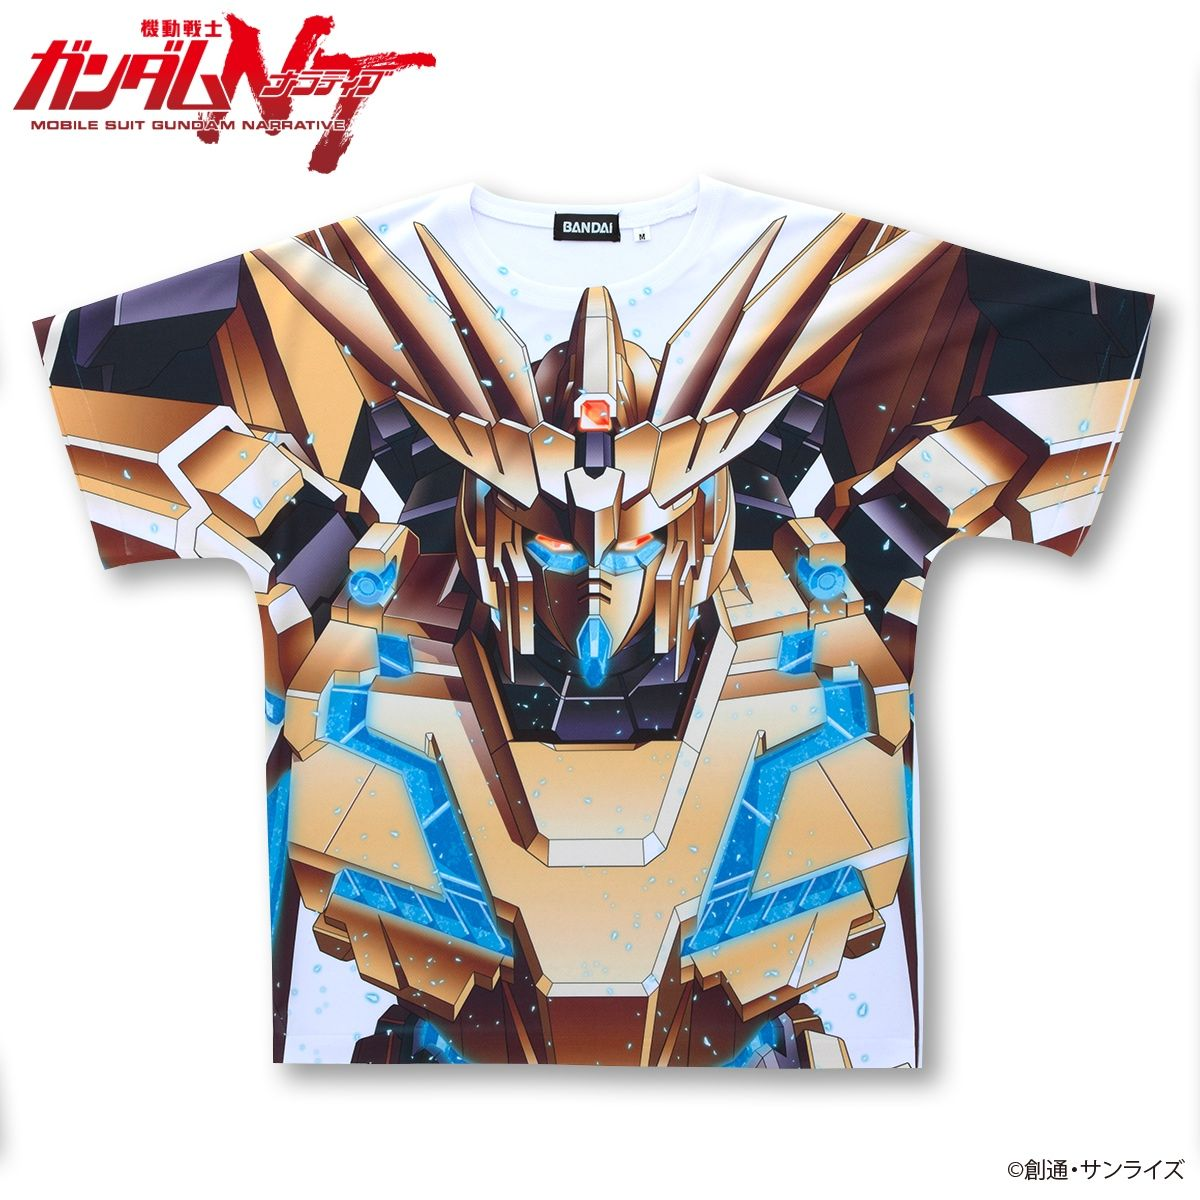 Mobile Suit Gundam Narrative All-Over Print T-shirt